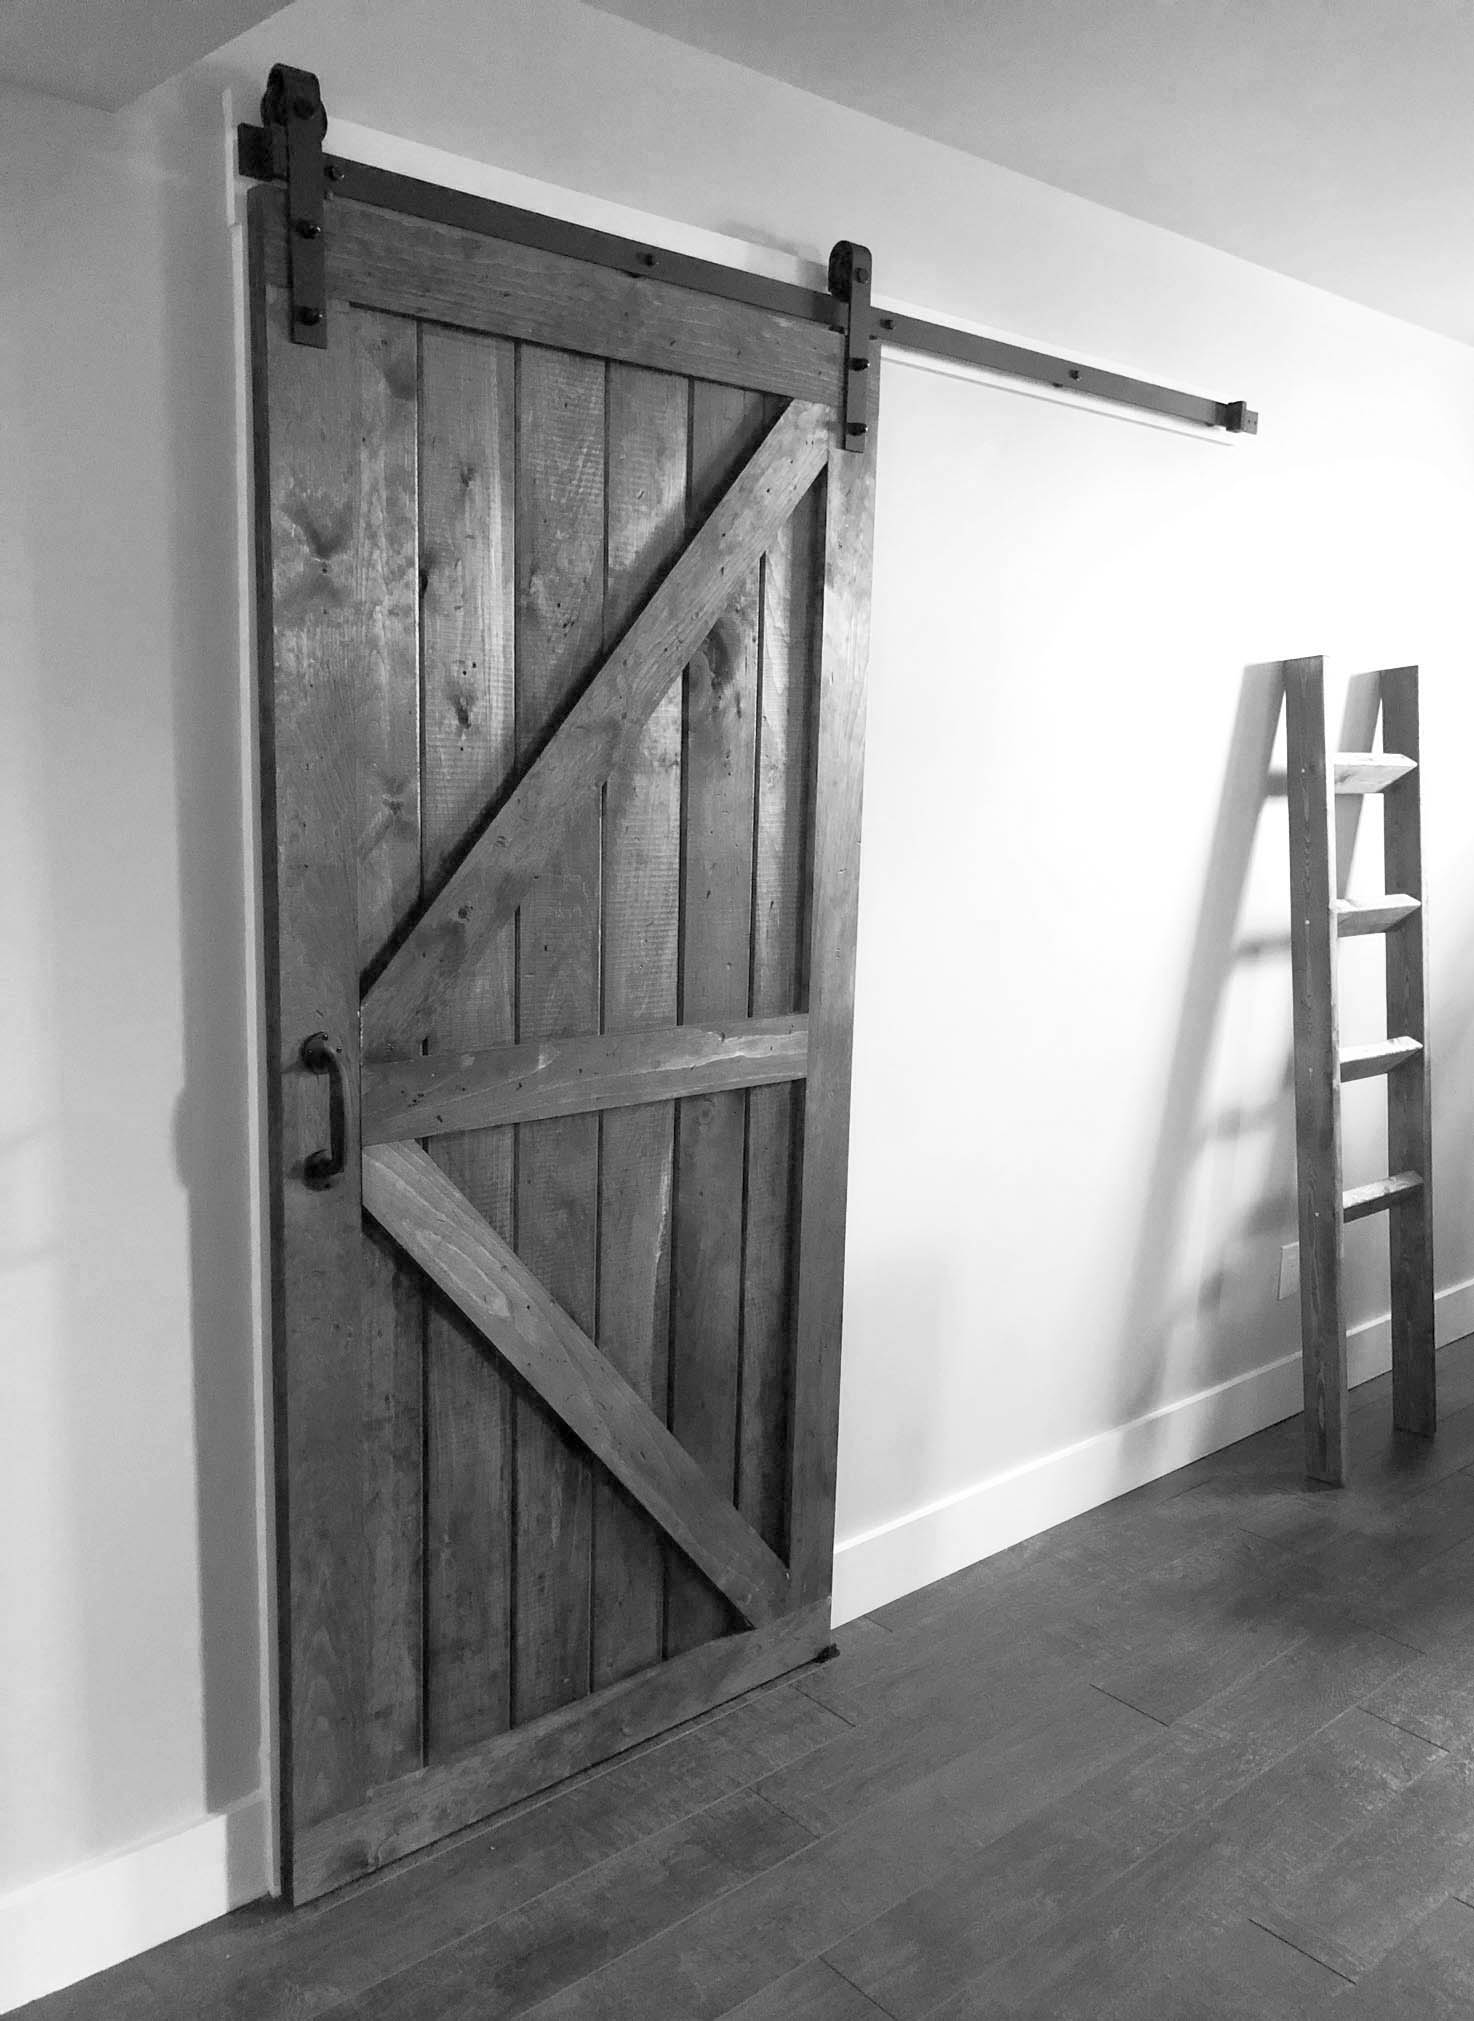 Barn Door - black and white